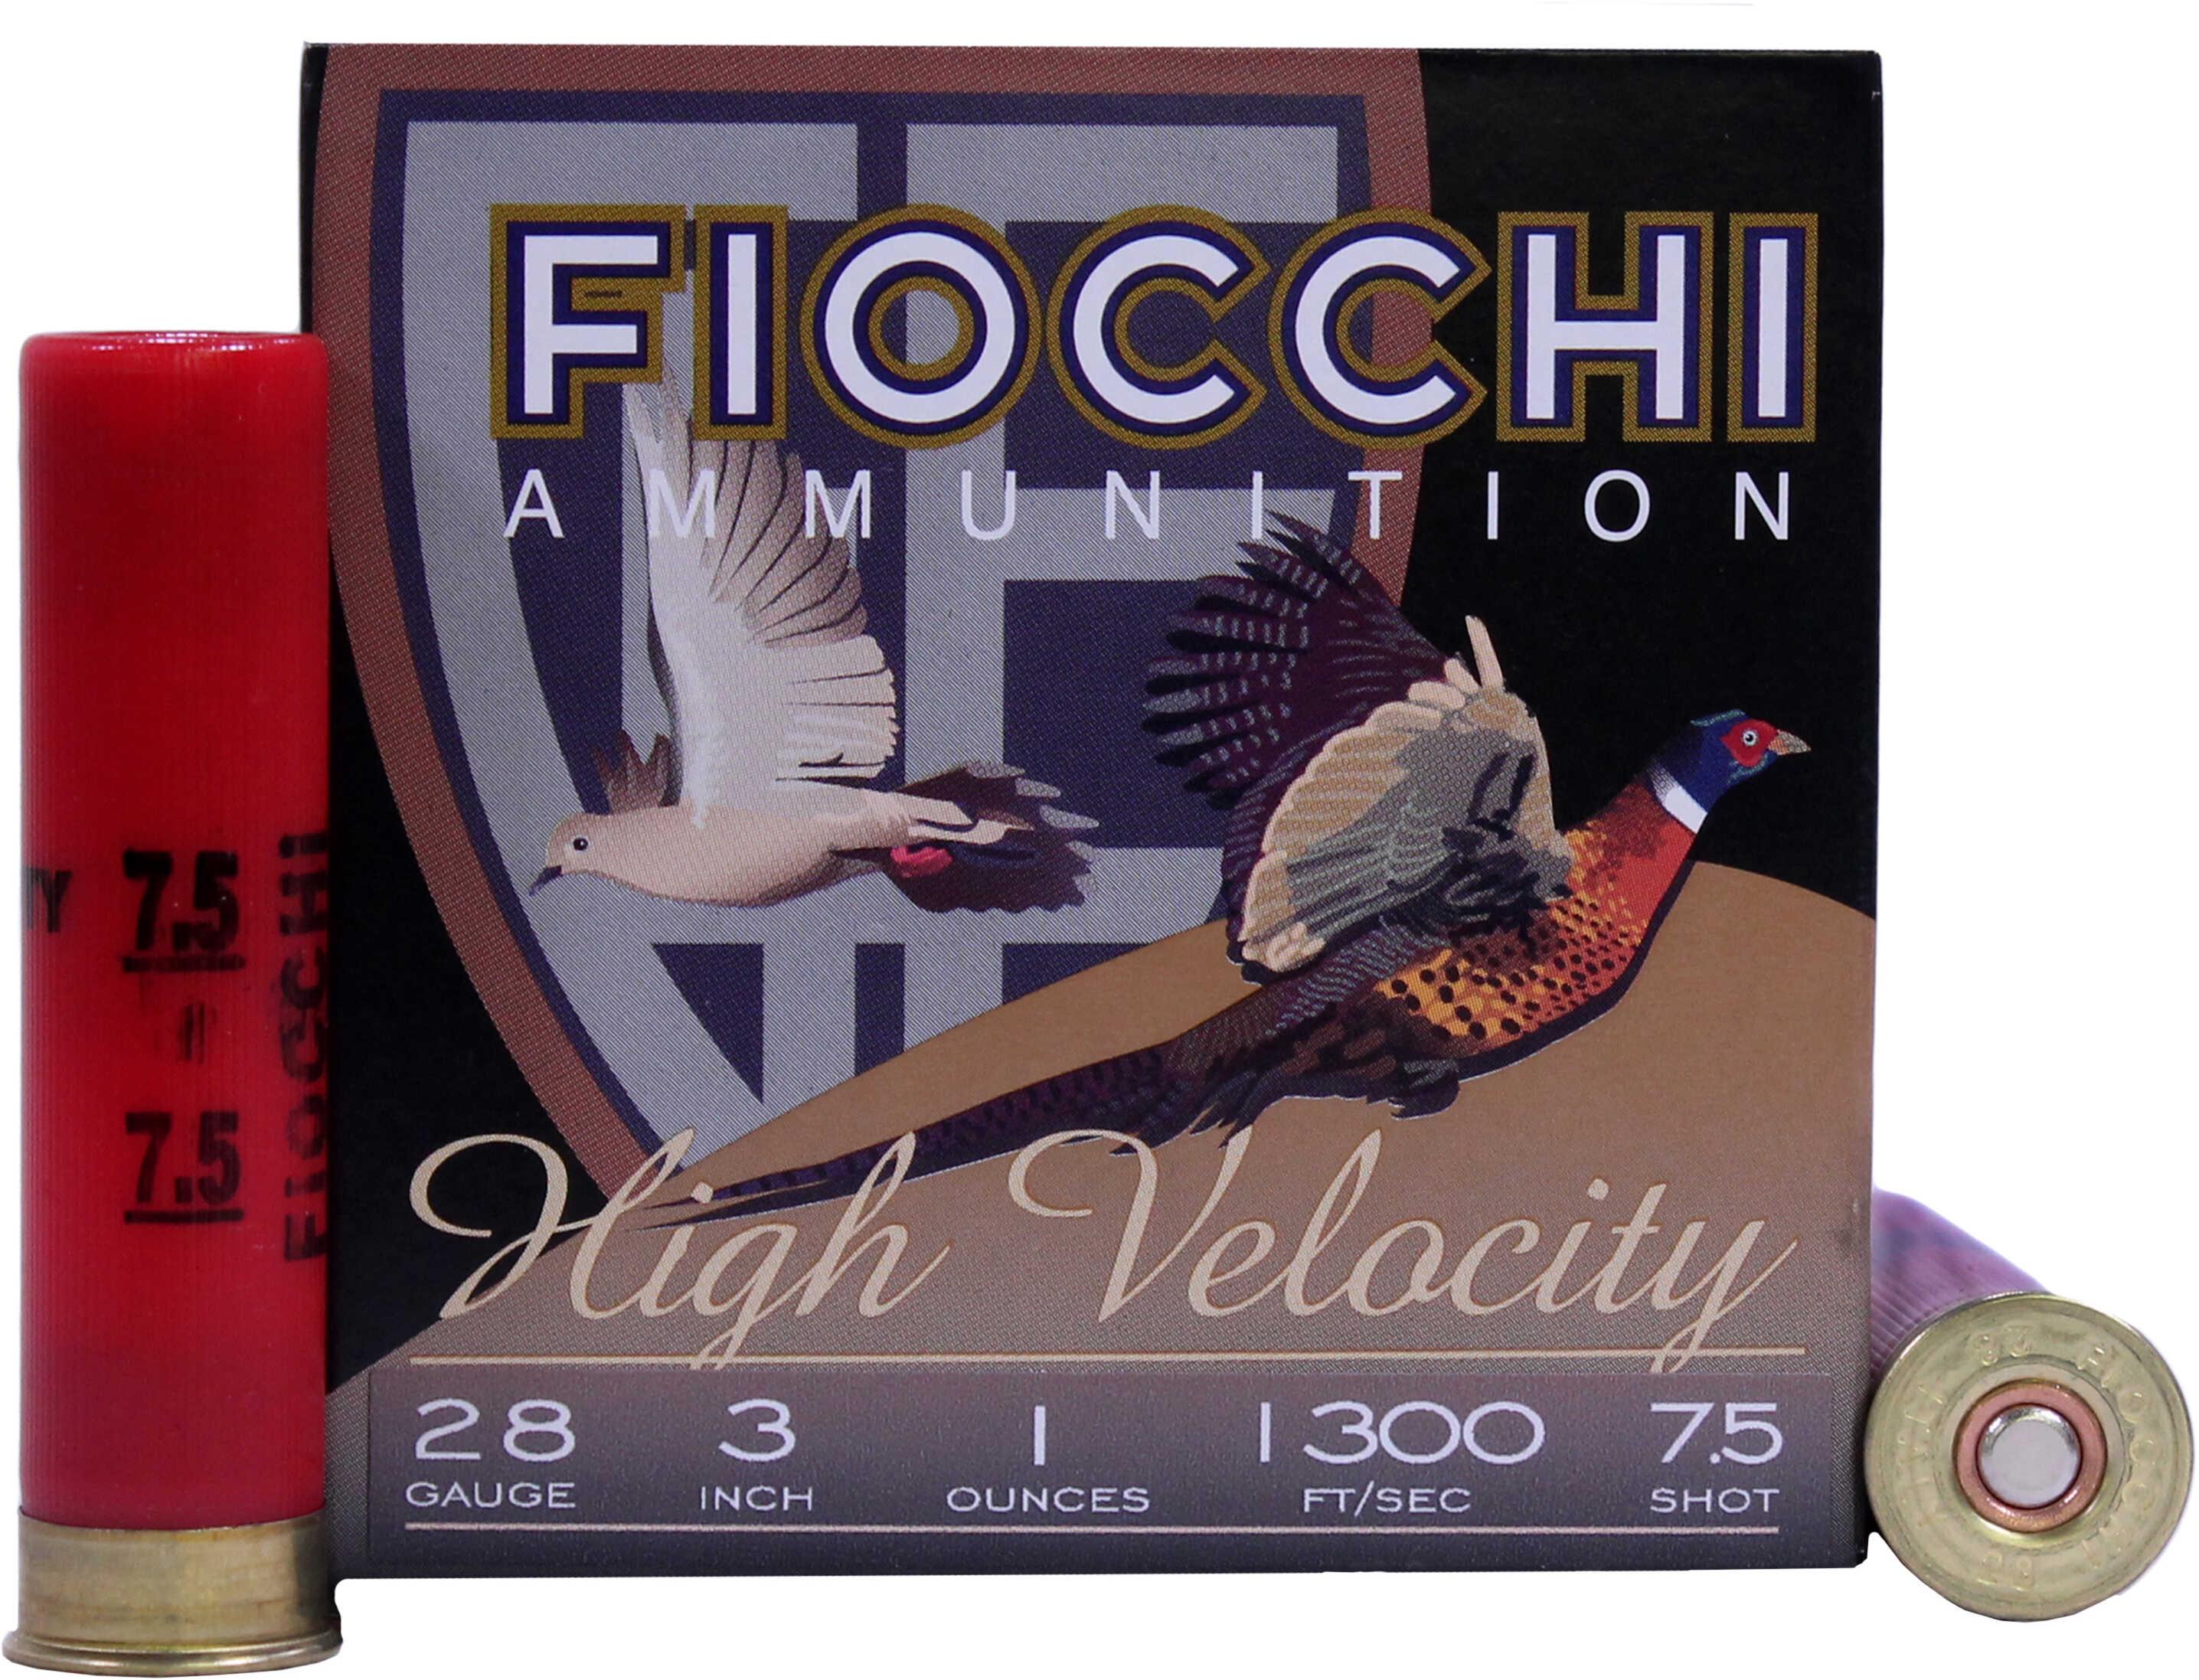 "Fiocchi 283HV75 High Velocity 28 Gauge 3"" 1 Oz 7.5 Shot 25 Bx/10 Cs"